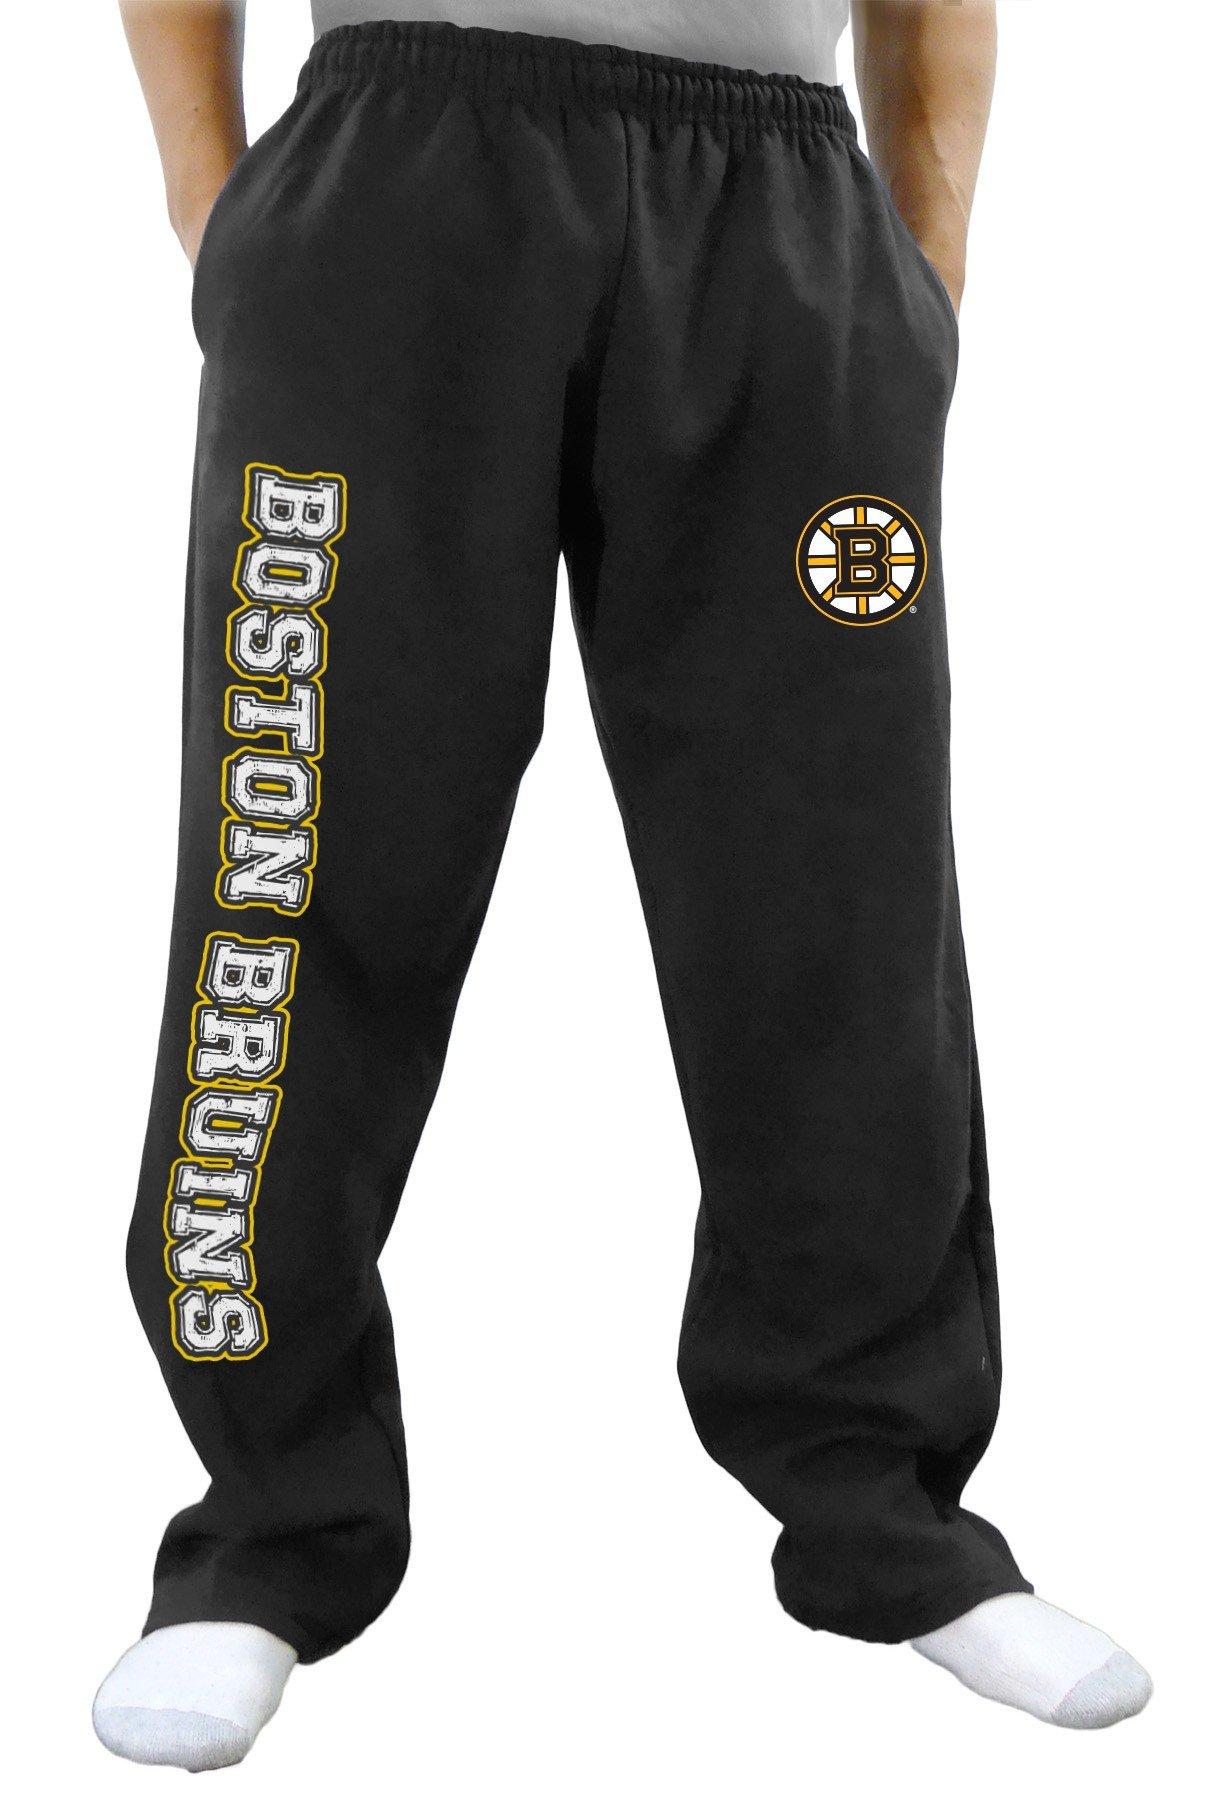 NHL Men's Premium Fleece Official Team Sweatpants (Boston Bruins, Small)